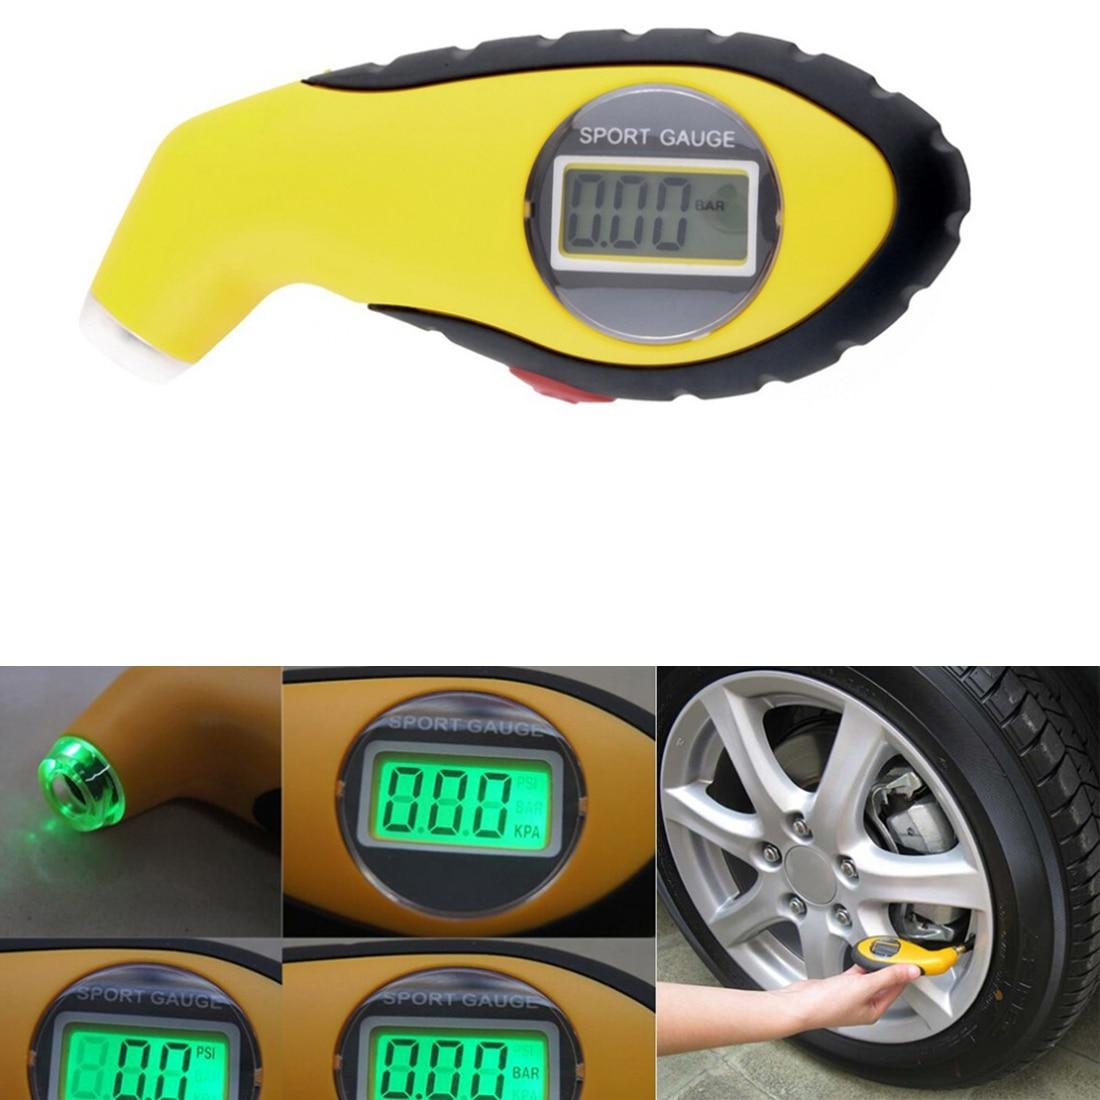 PSI Digital Tire Tyre Air Pressure Gauge Tester Tool For Auto Car Motorcycle PSI KPA BAR New